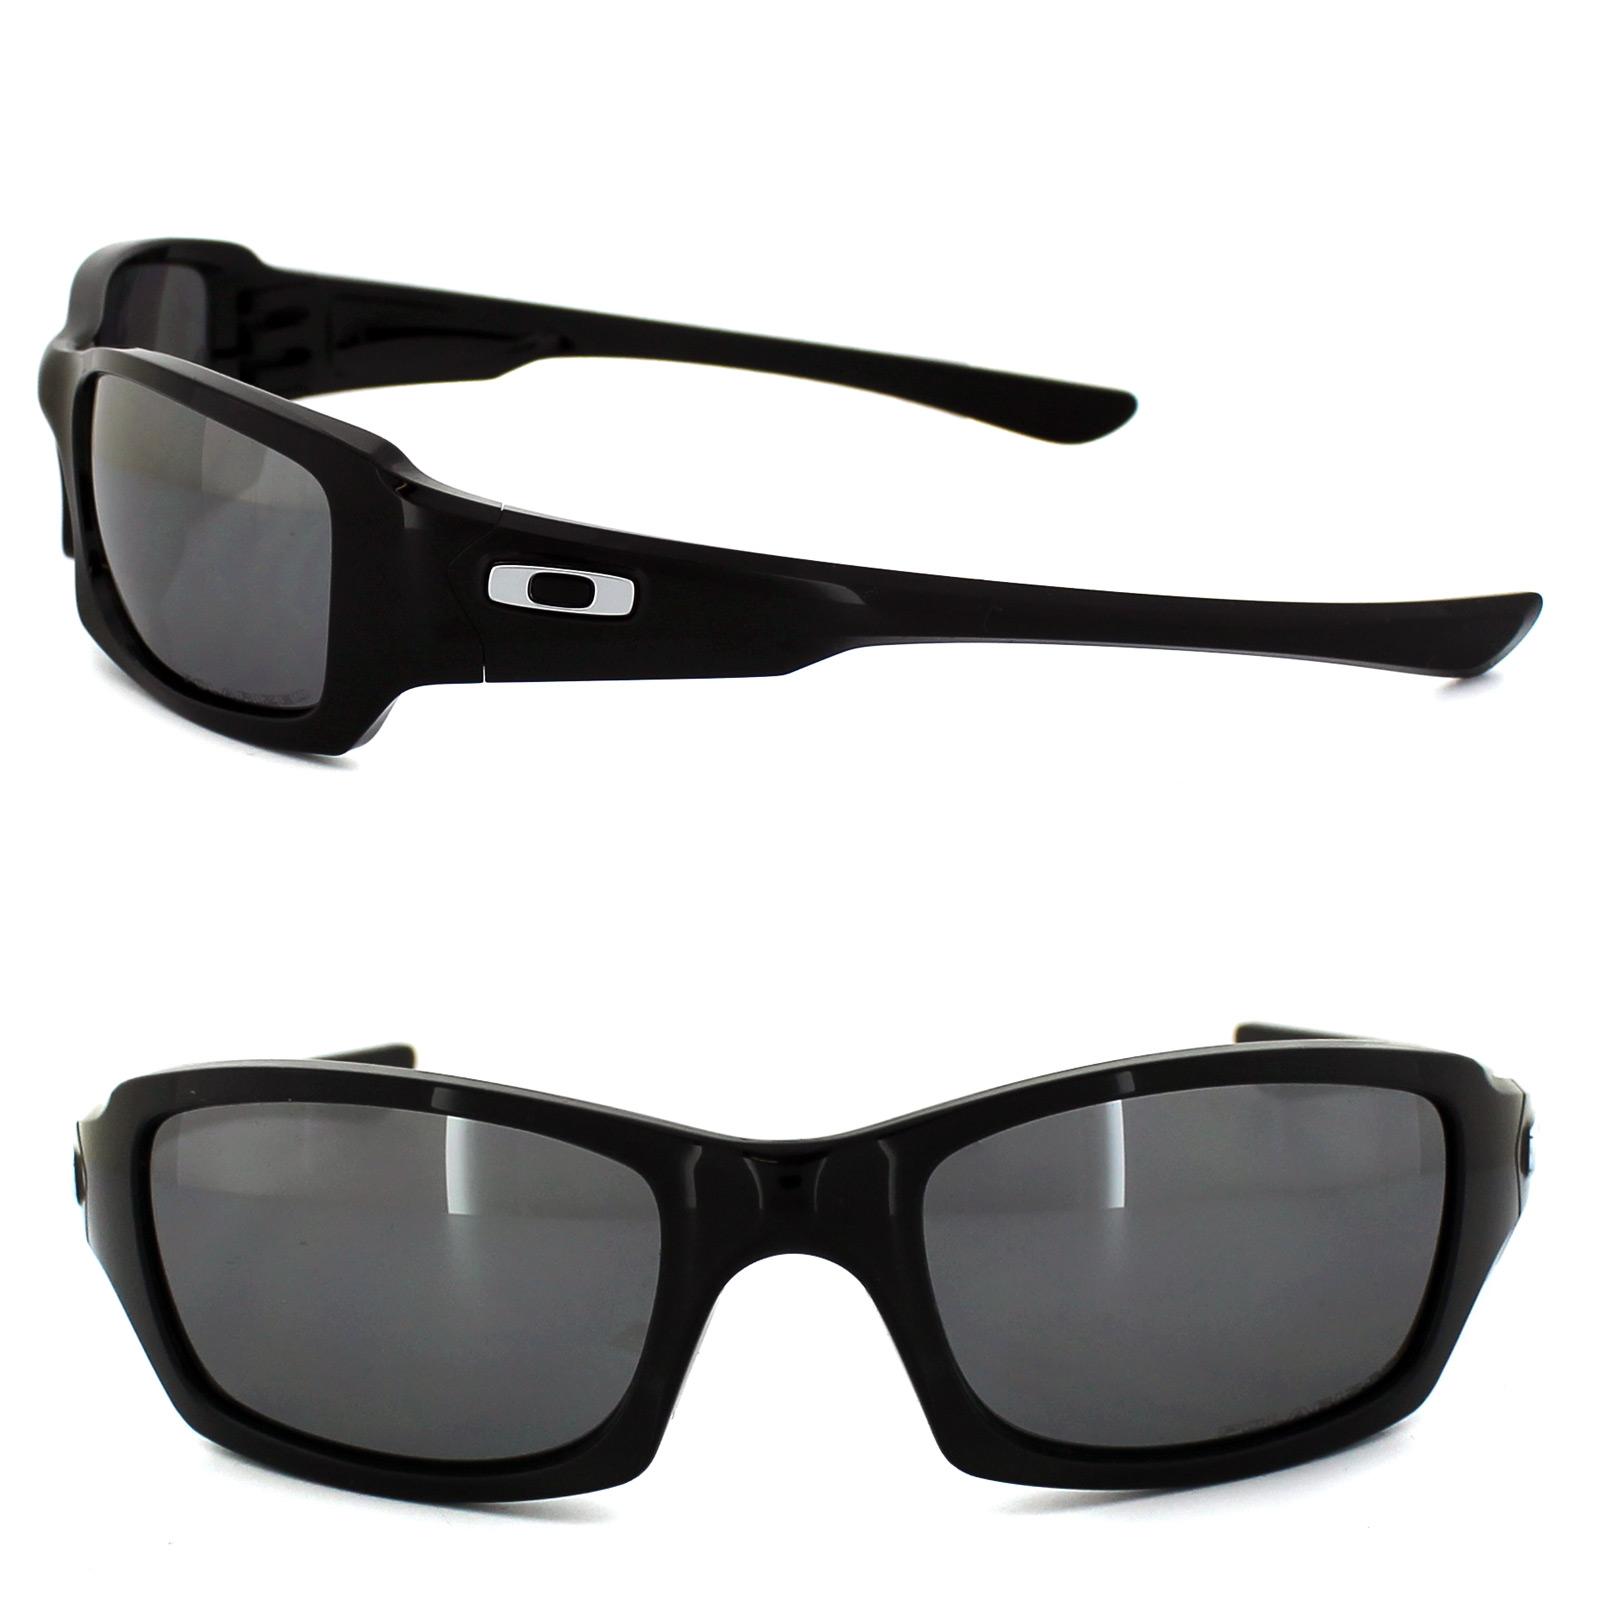 2ca3f4893c Sentinel Oakley Sunglasses Fives Squared OO9238-06 Polished Black Black  Iridium Polarized